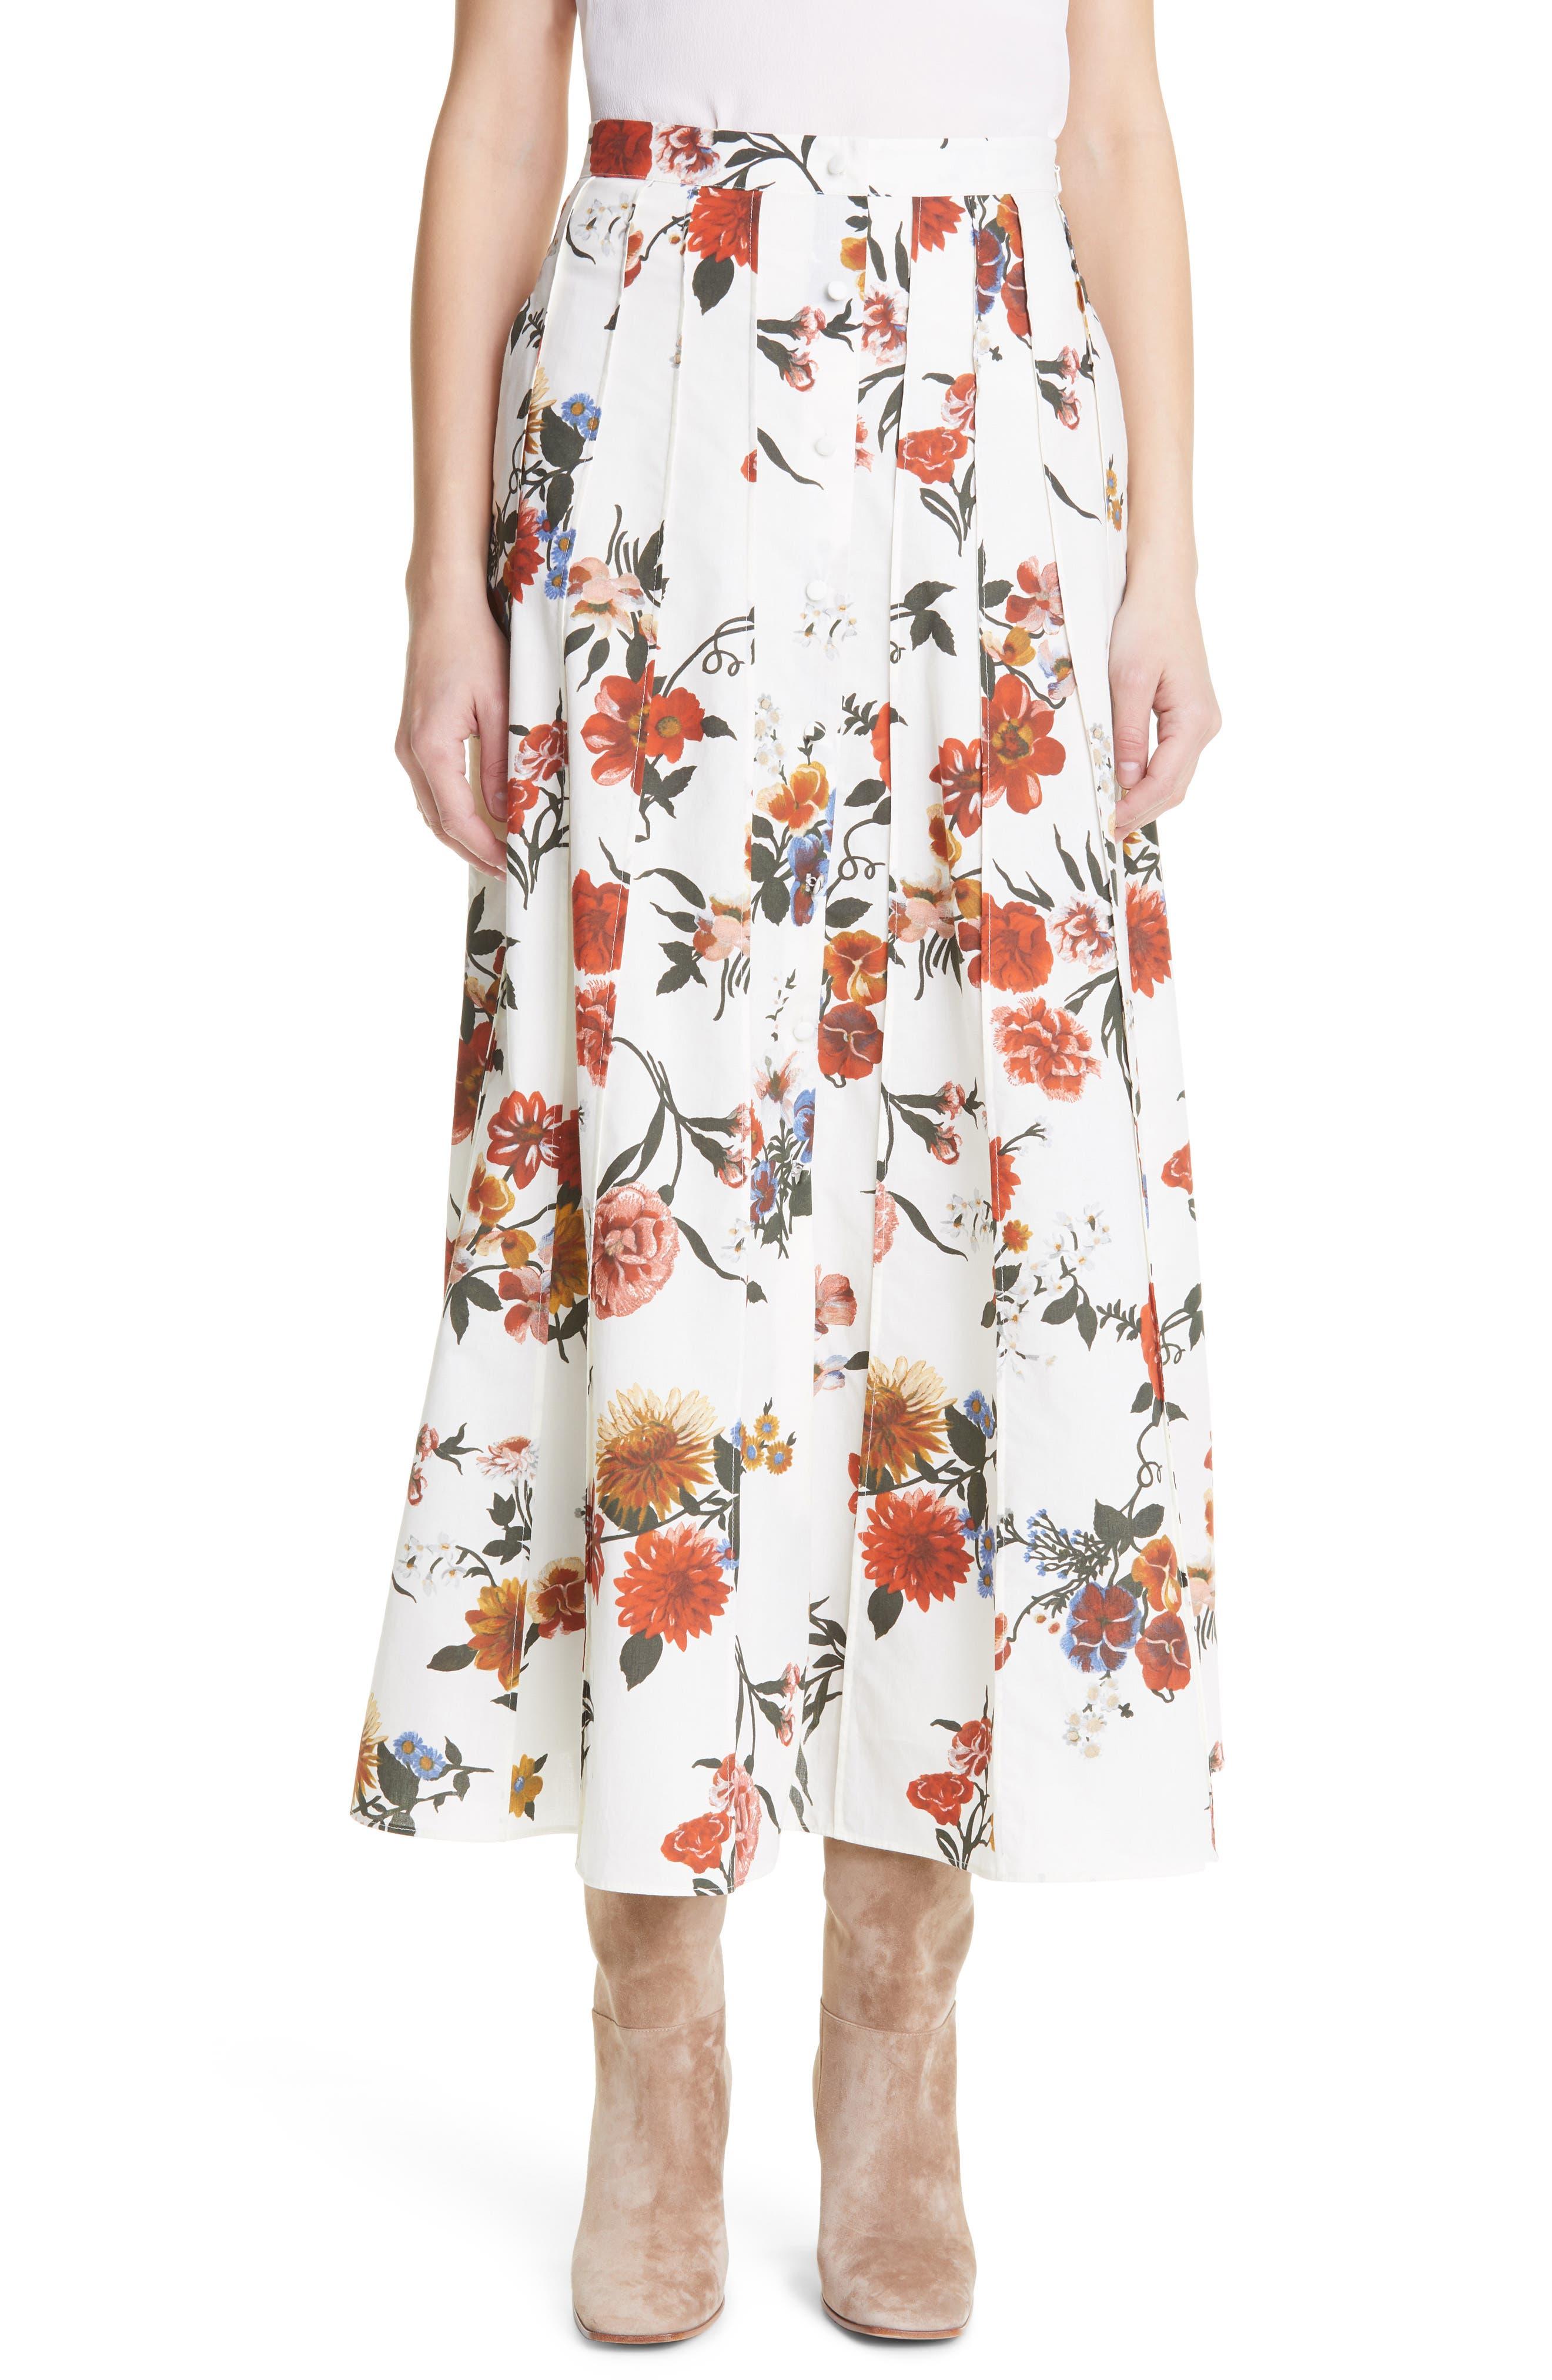 Sonia Floral Print Pleat Button Front Cotton Skirt